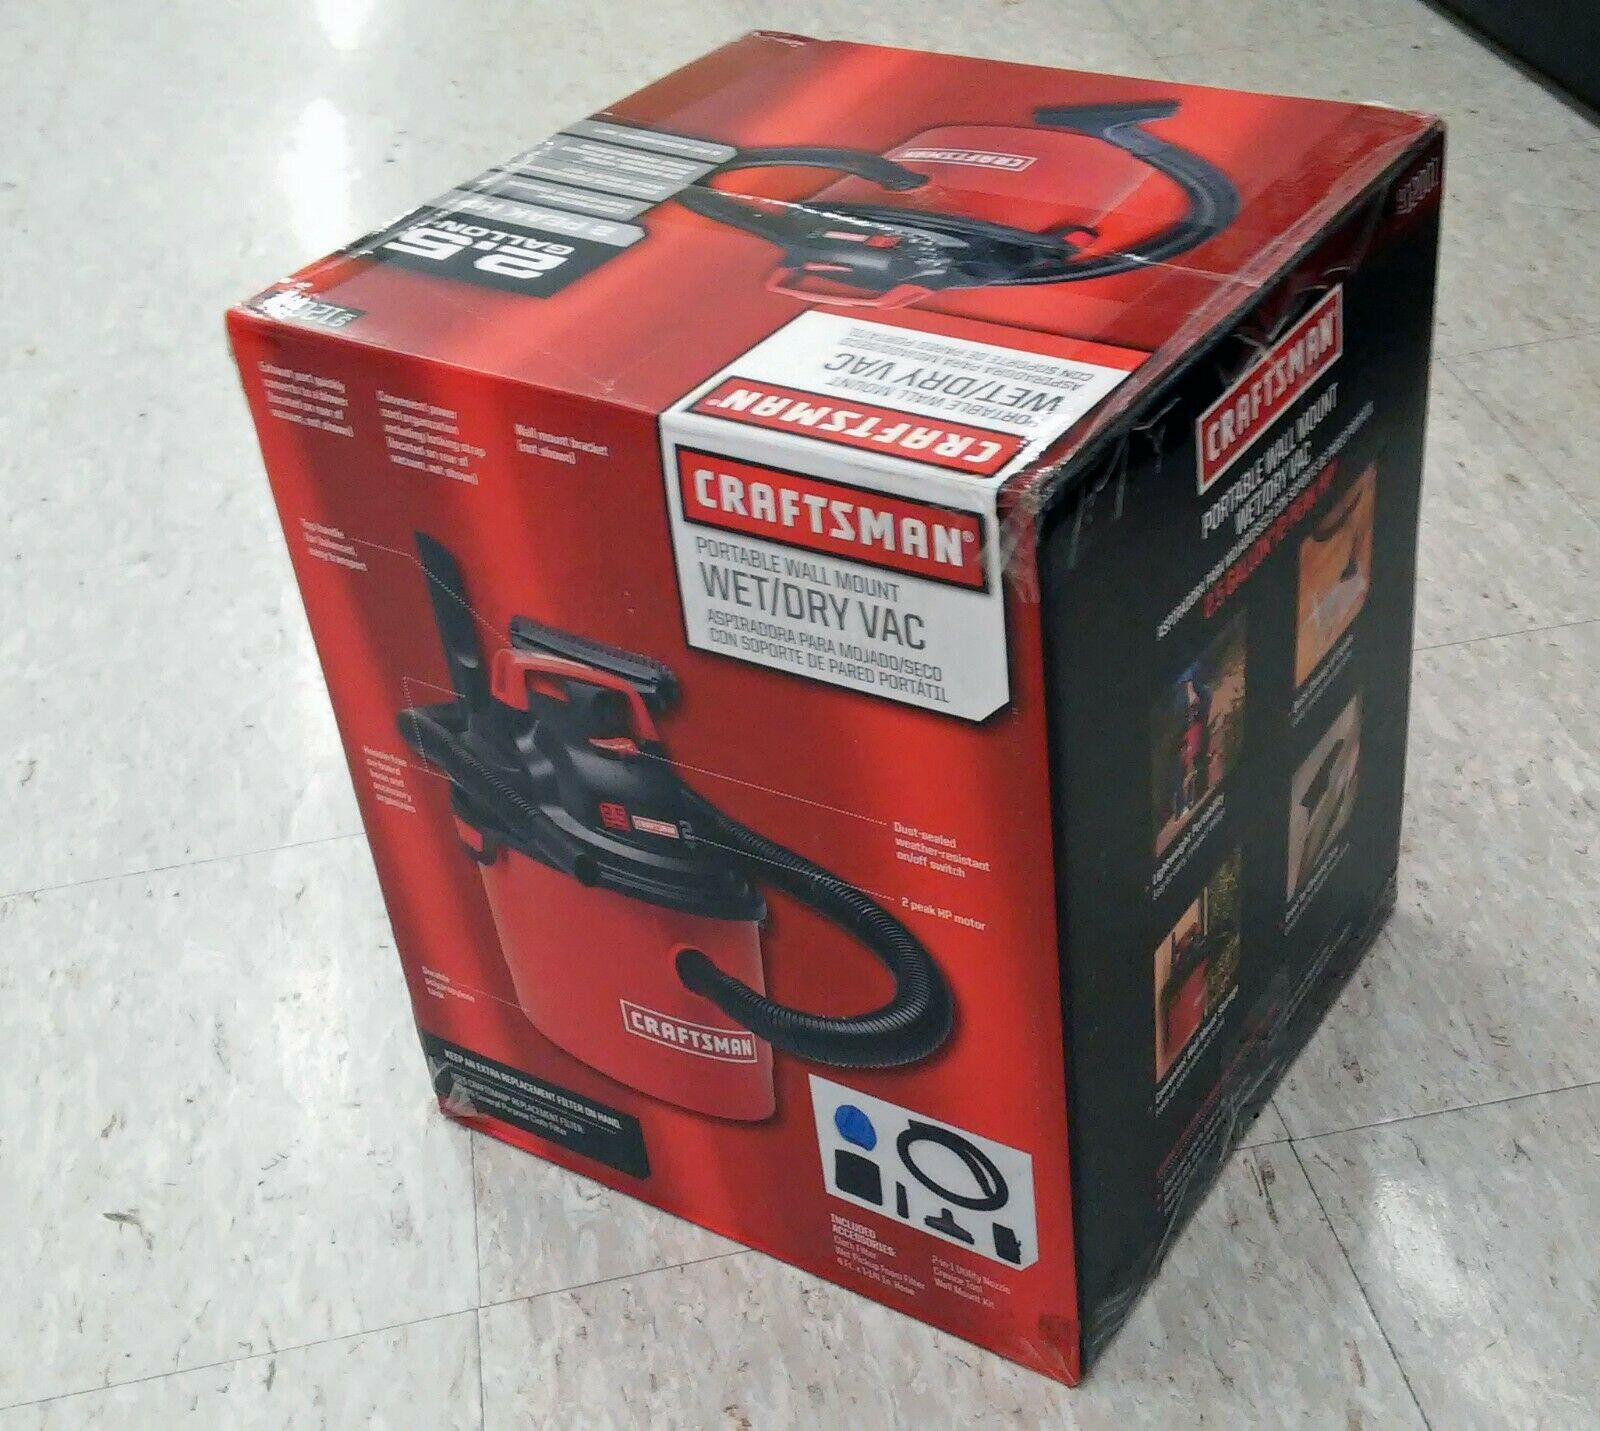 Craftsman Wall Mount Wet Dry Vacuum Blower Portable Shop Set 2.5 Gal 2 HP